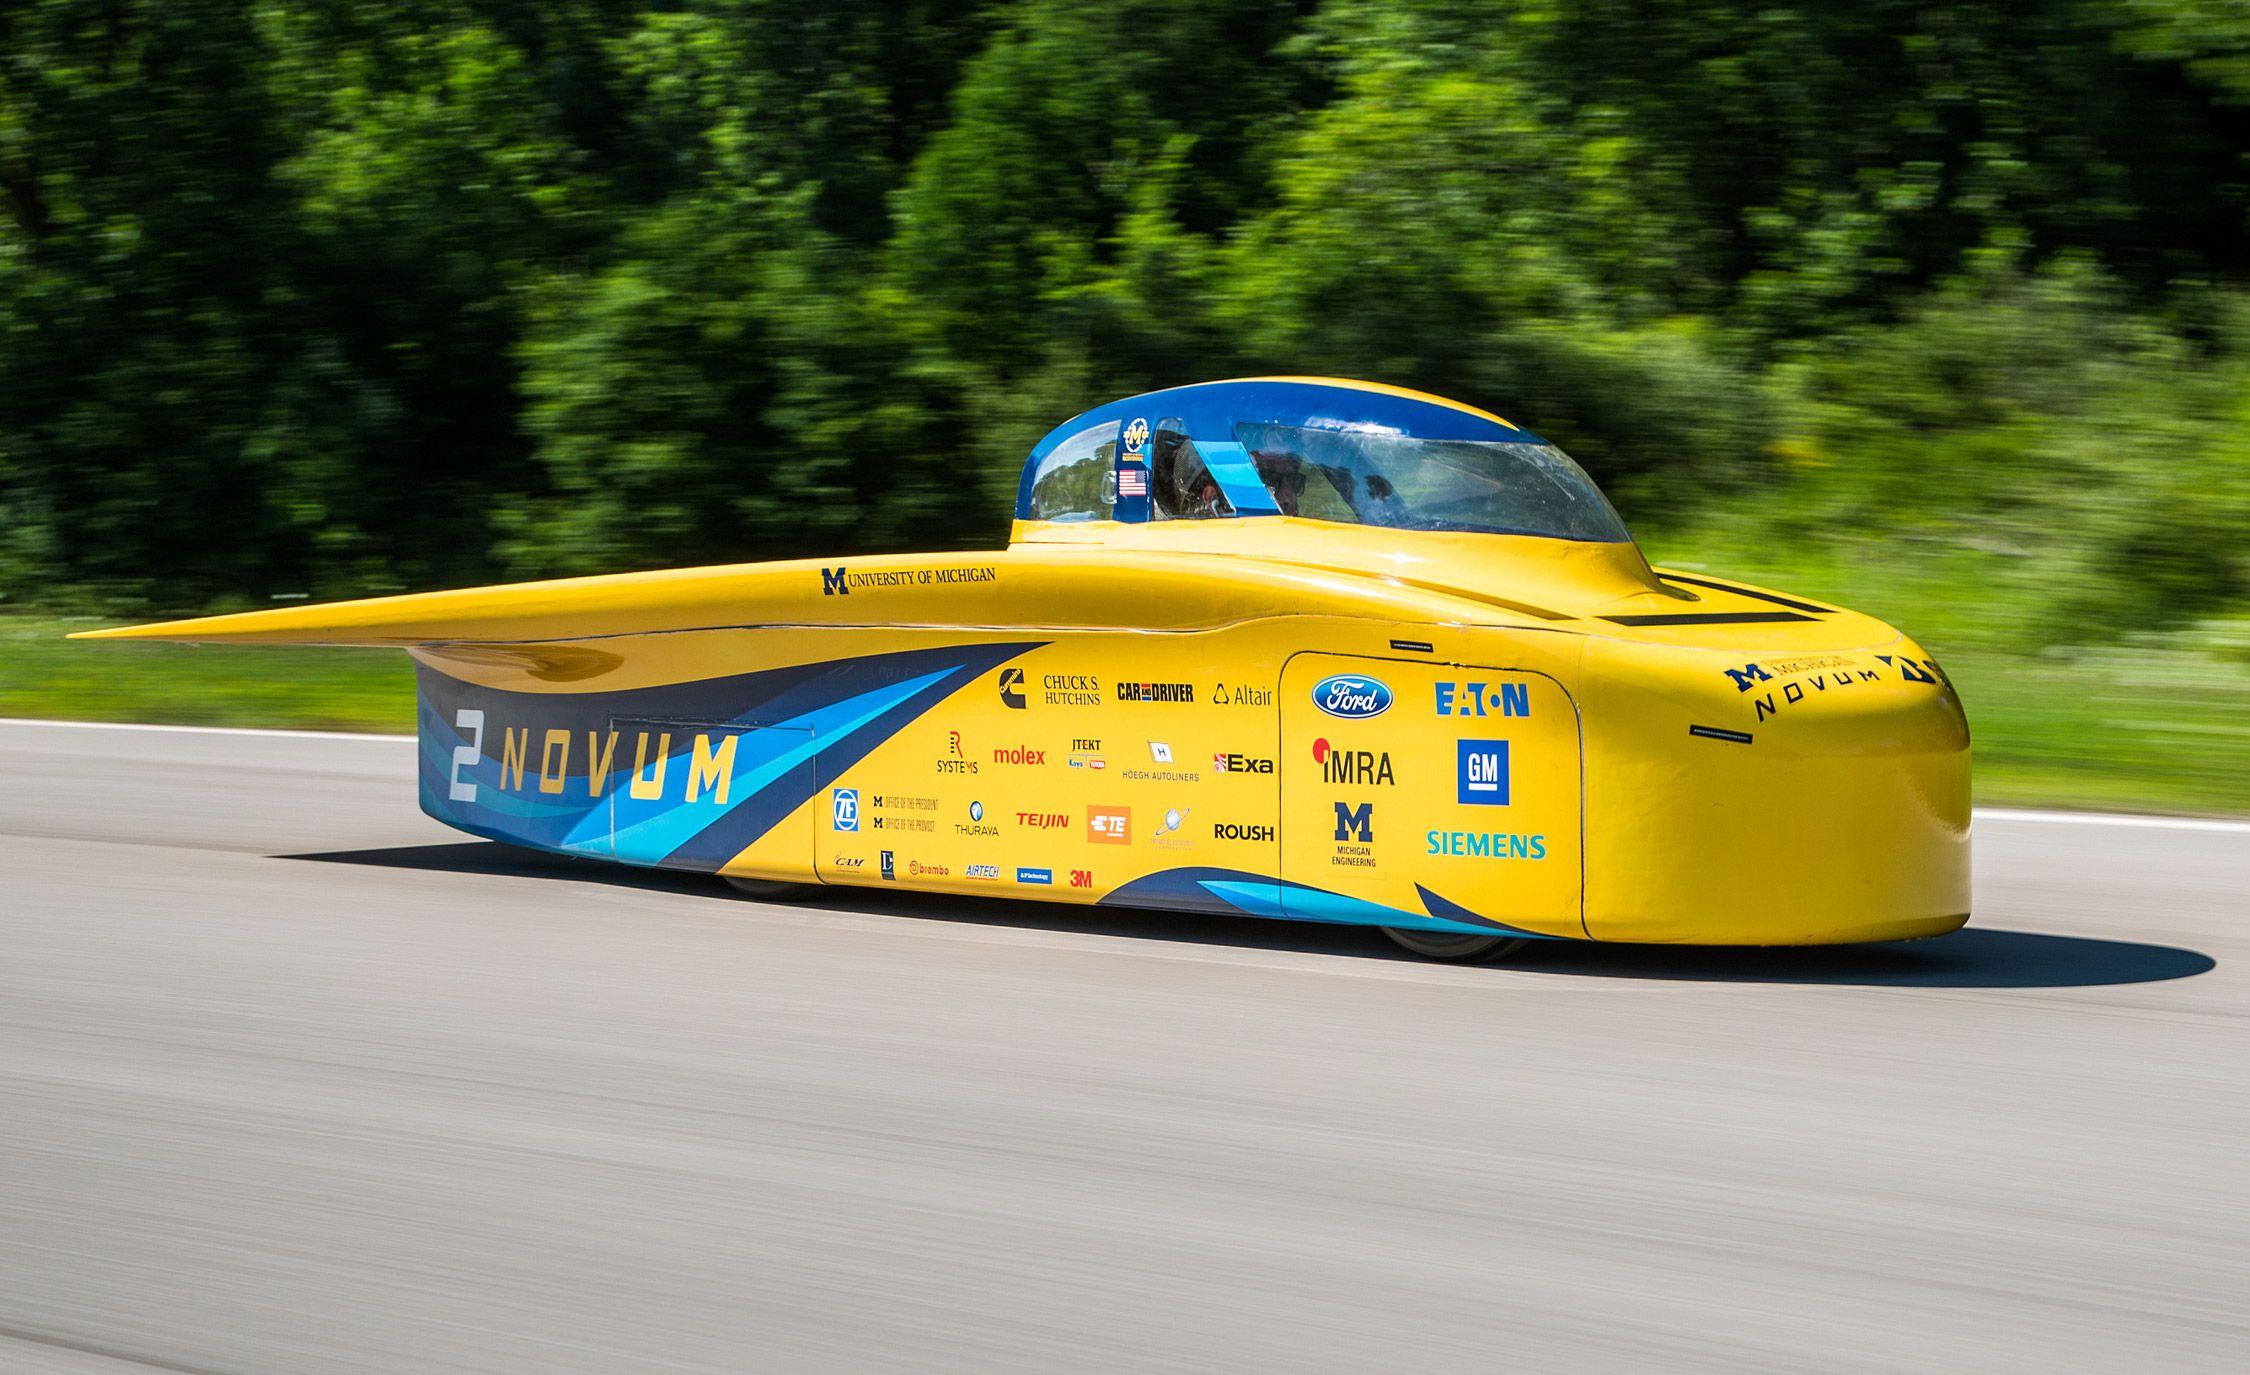 We Test The University Of Michigan S Quot Novum Quot Solar Car